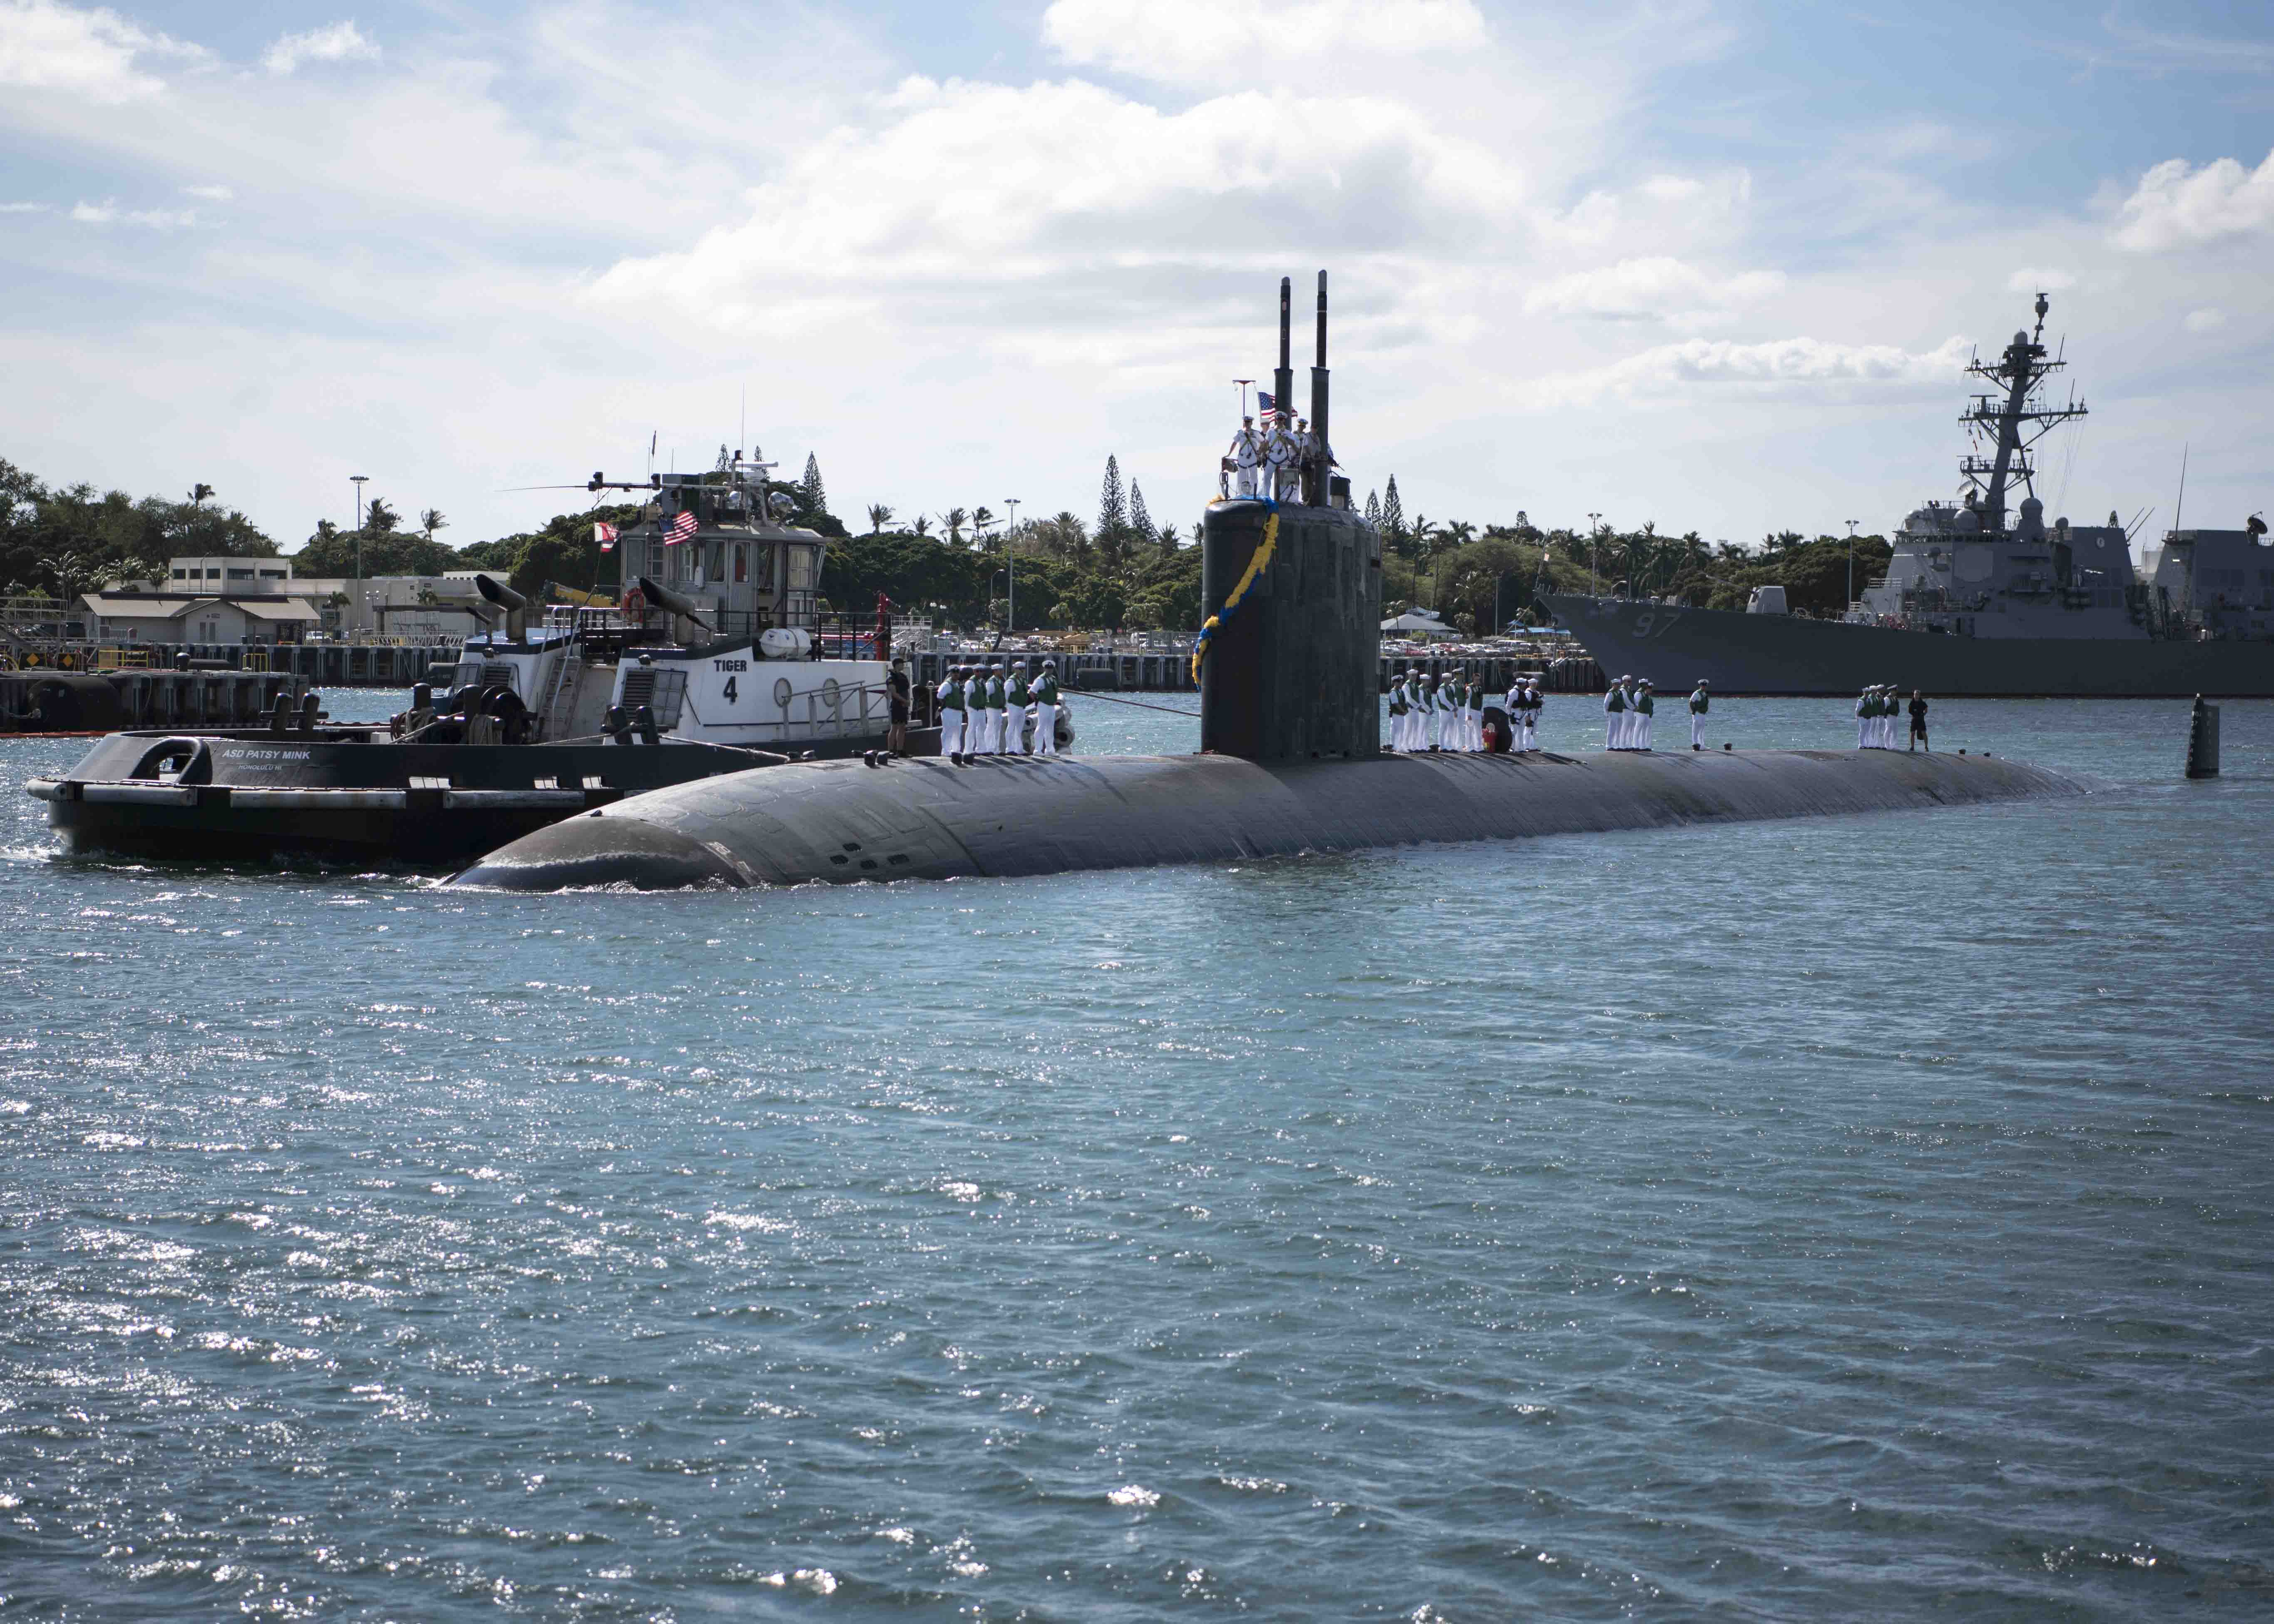 USS COLUMBIA SSN-771 Einlaufen Pearl Harbor am 18.11.2016 Bild: U.S. Navy